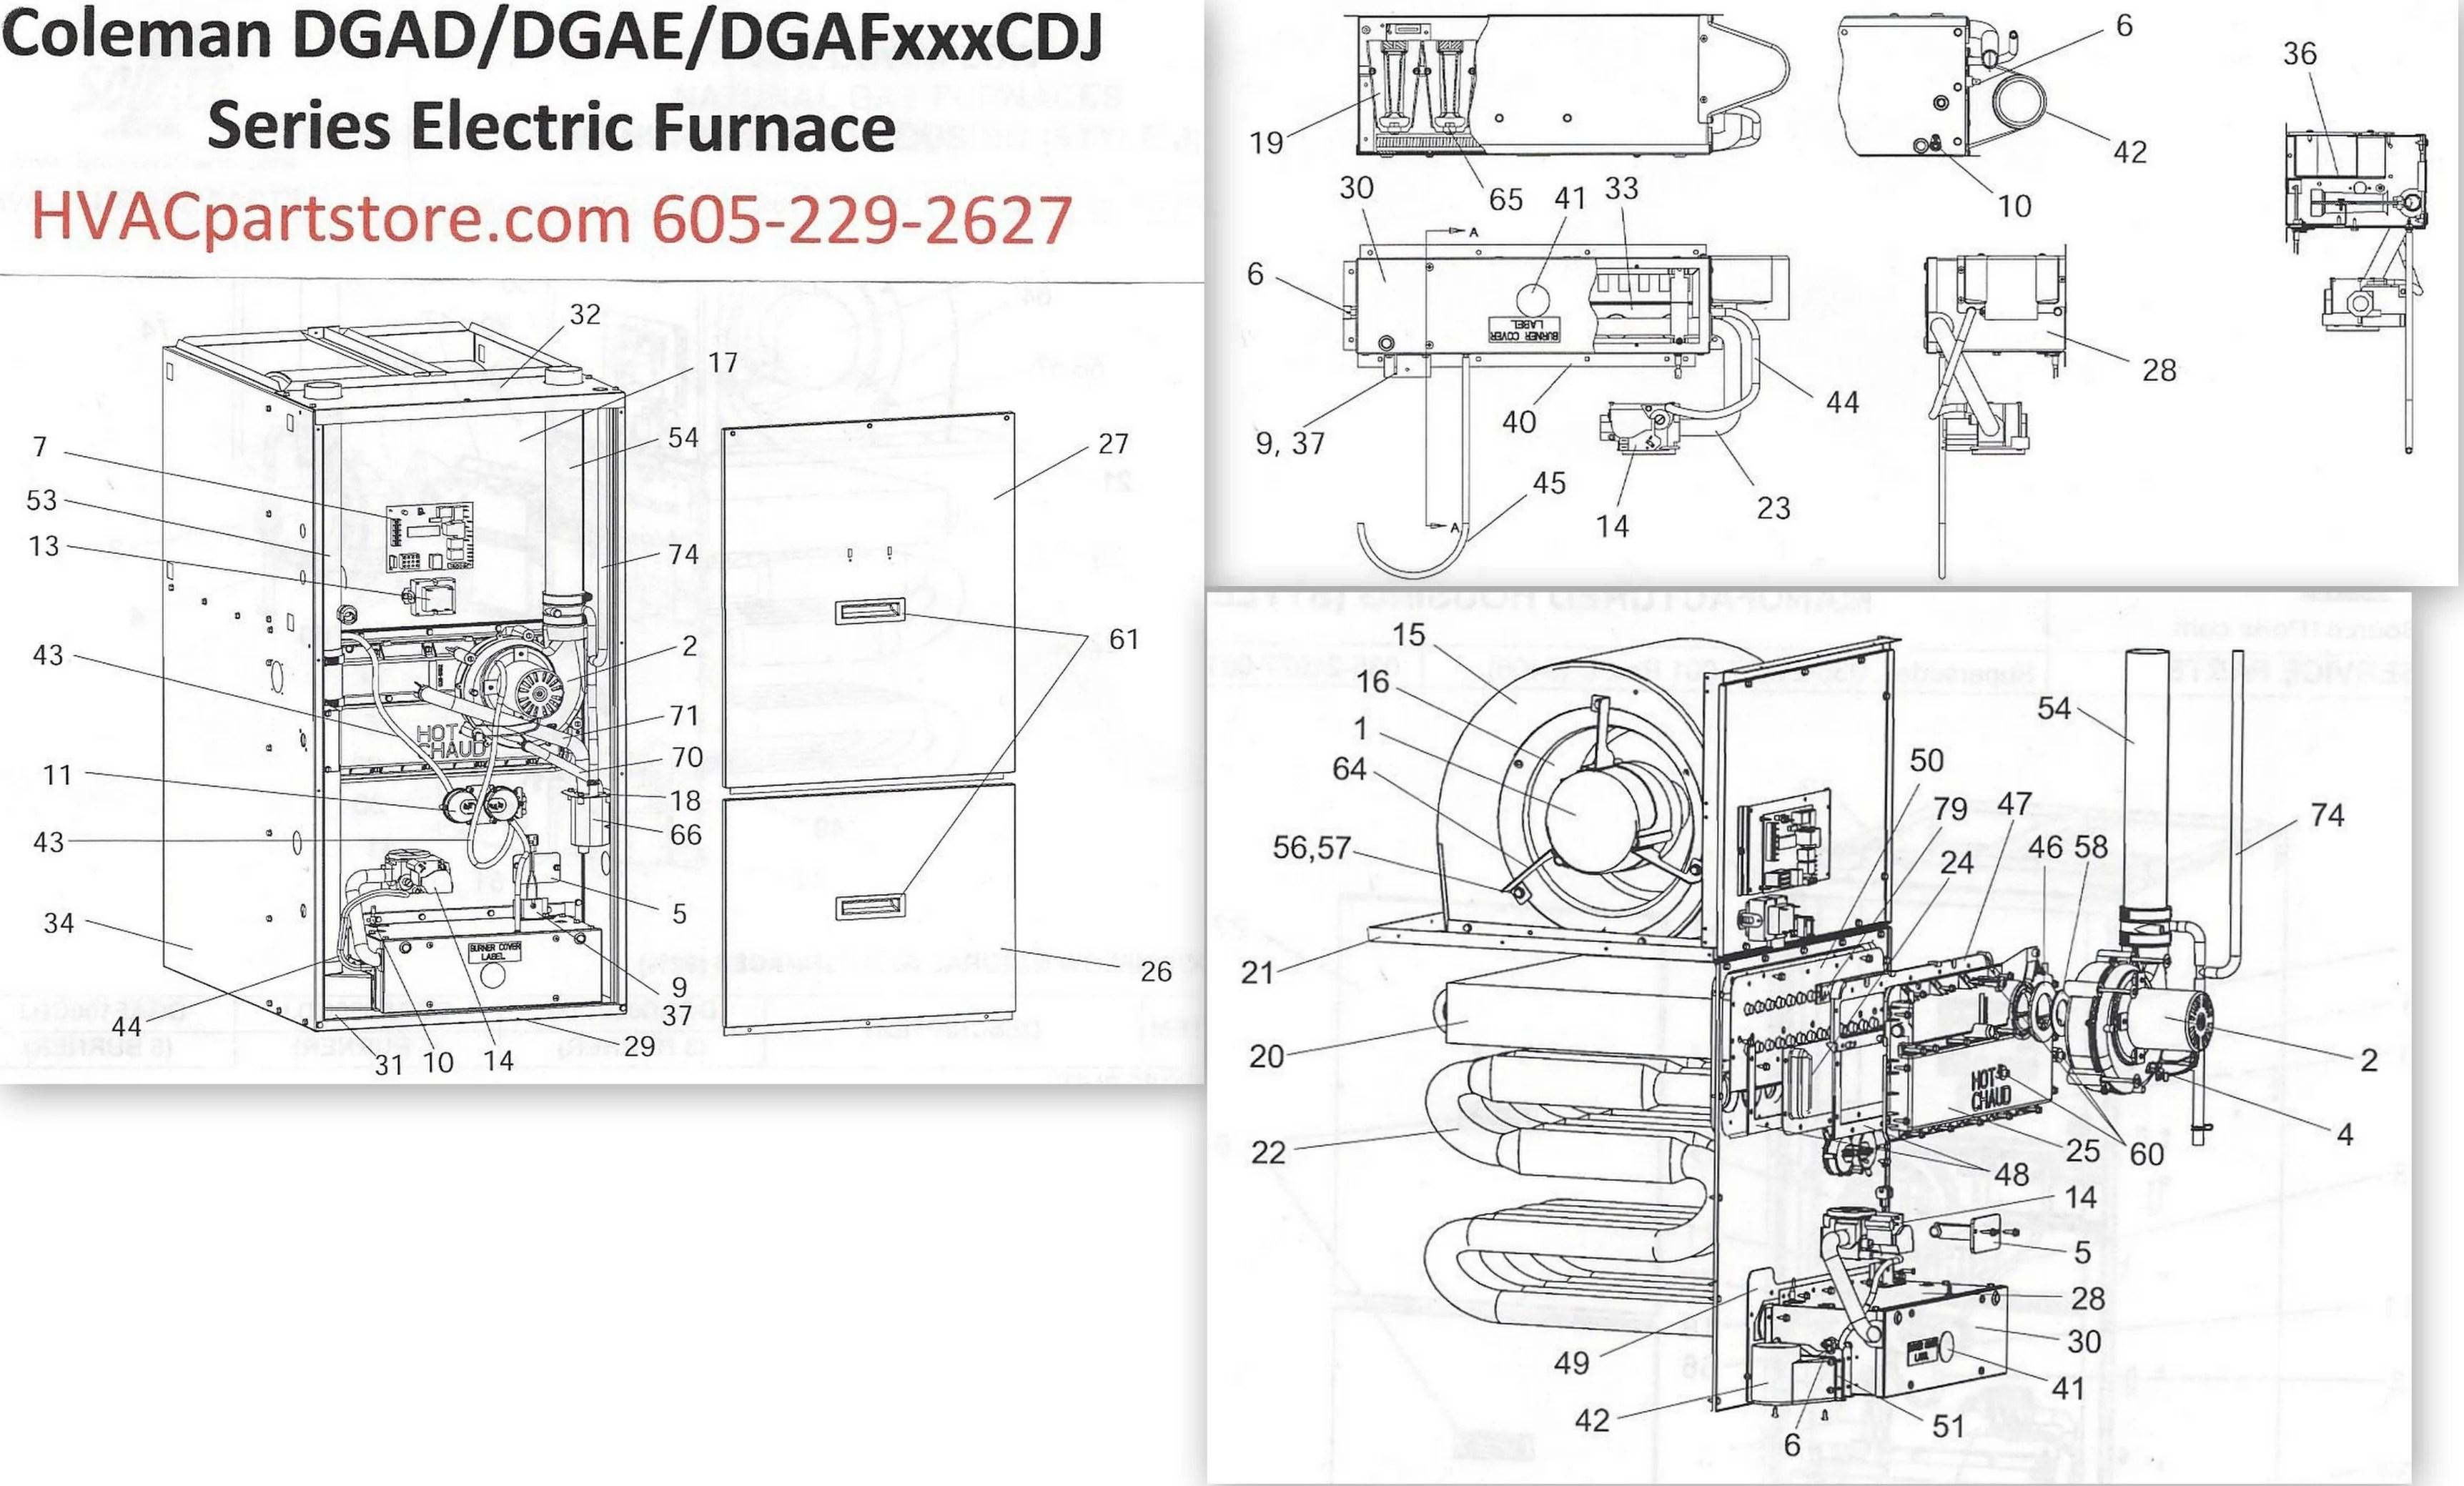 DGAE080CDJ Coleman Gas Furnace Parts – HVACpartstore